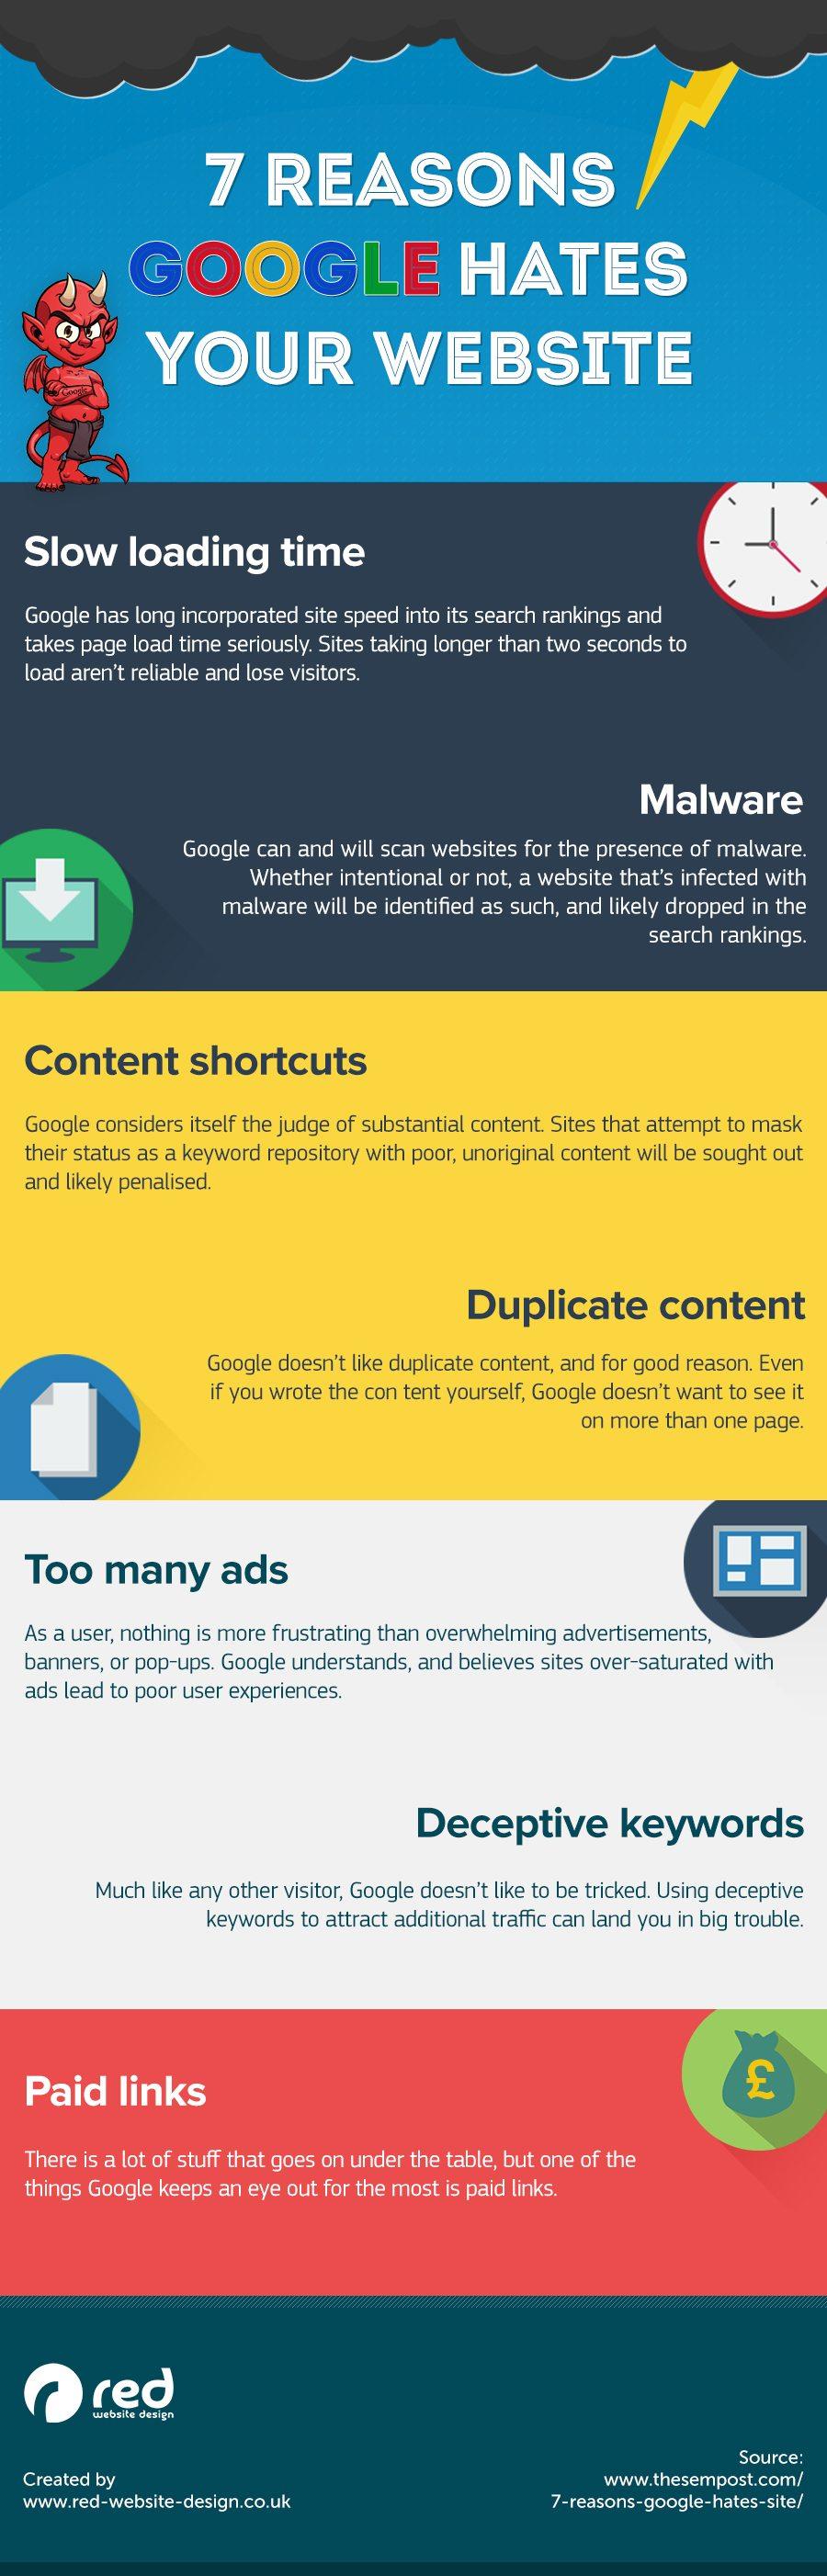 7 razones por las que Google odia tu web #infografia #infographic #seo